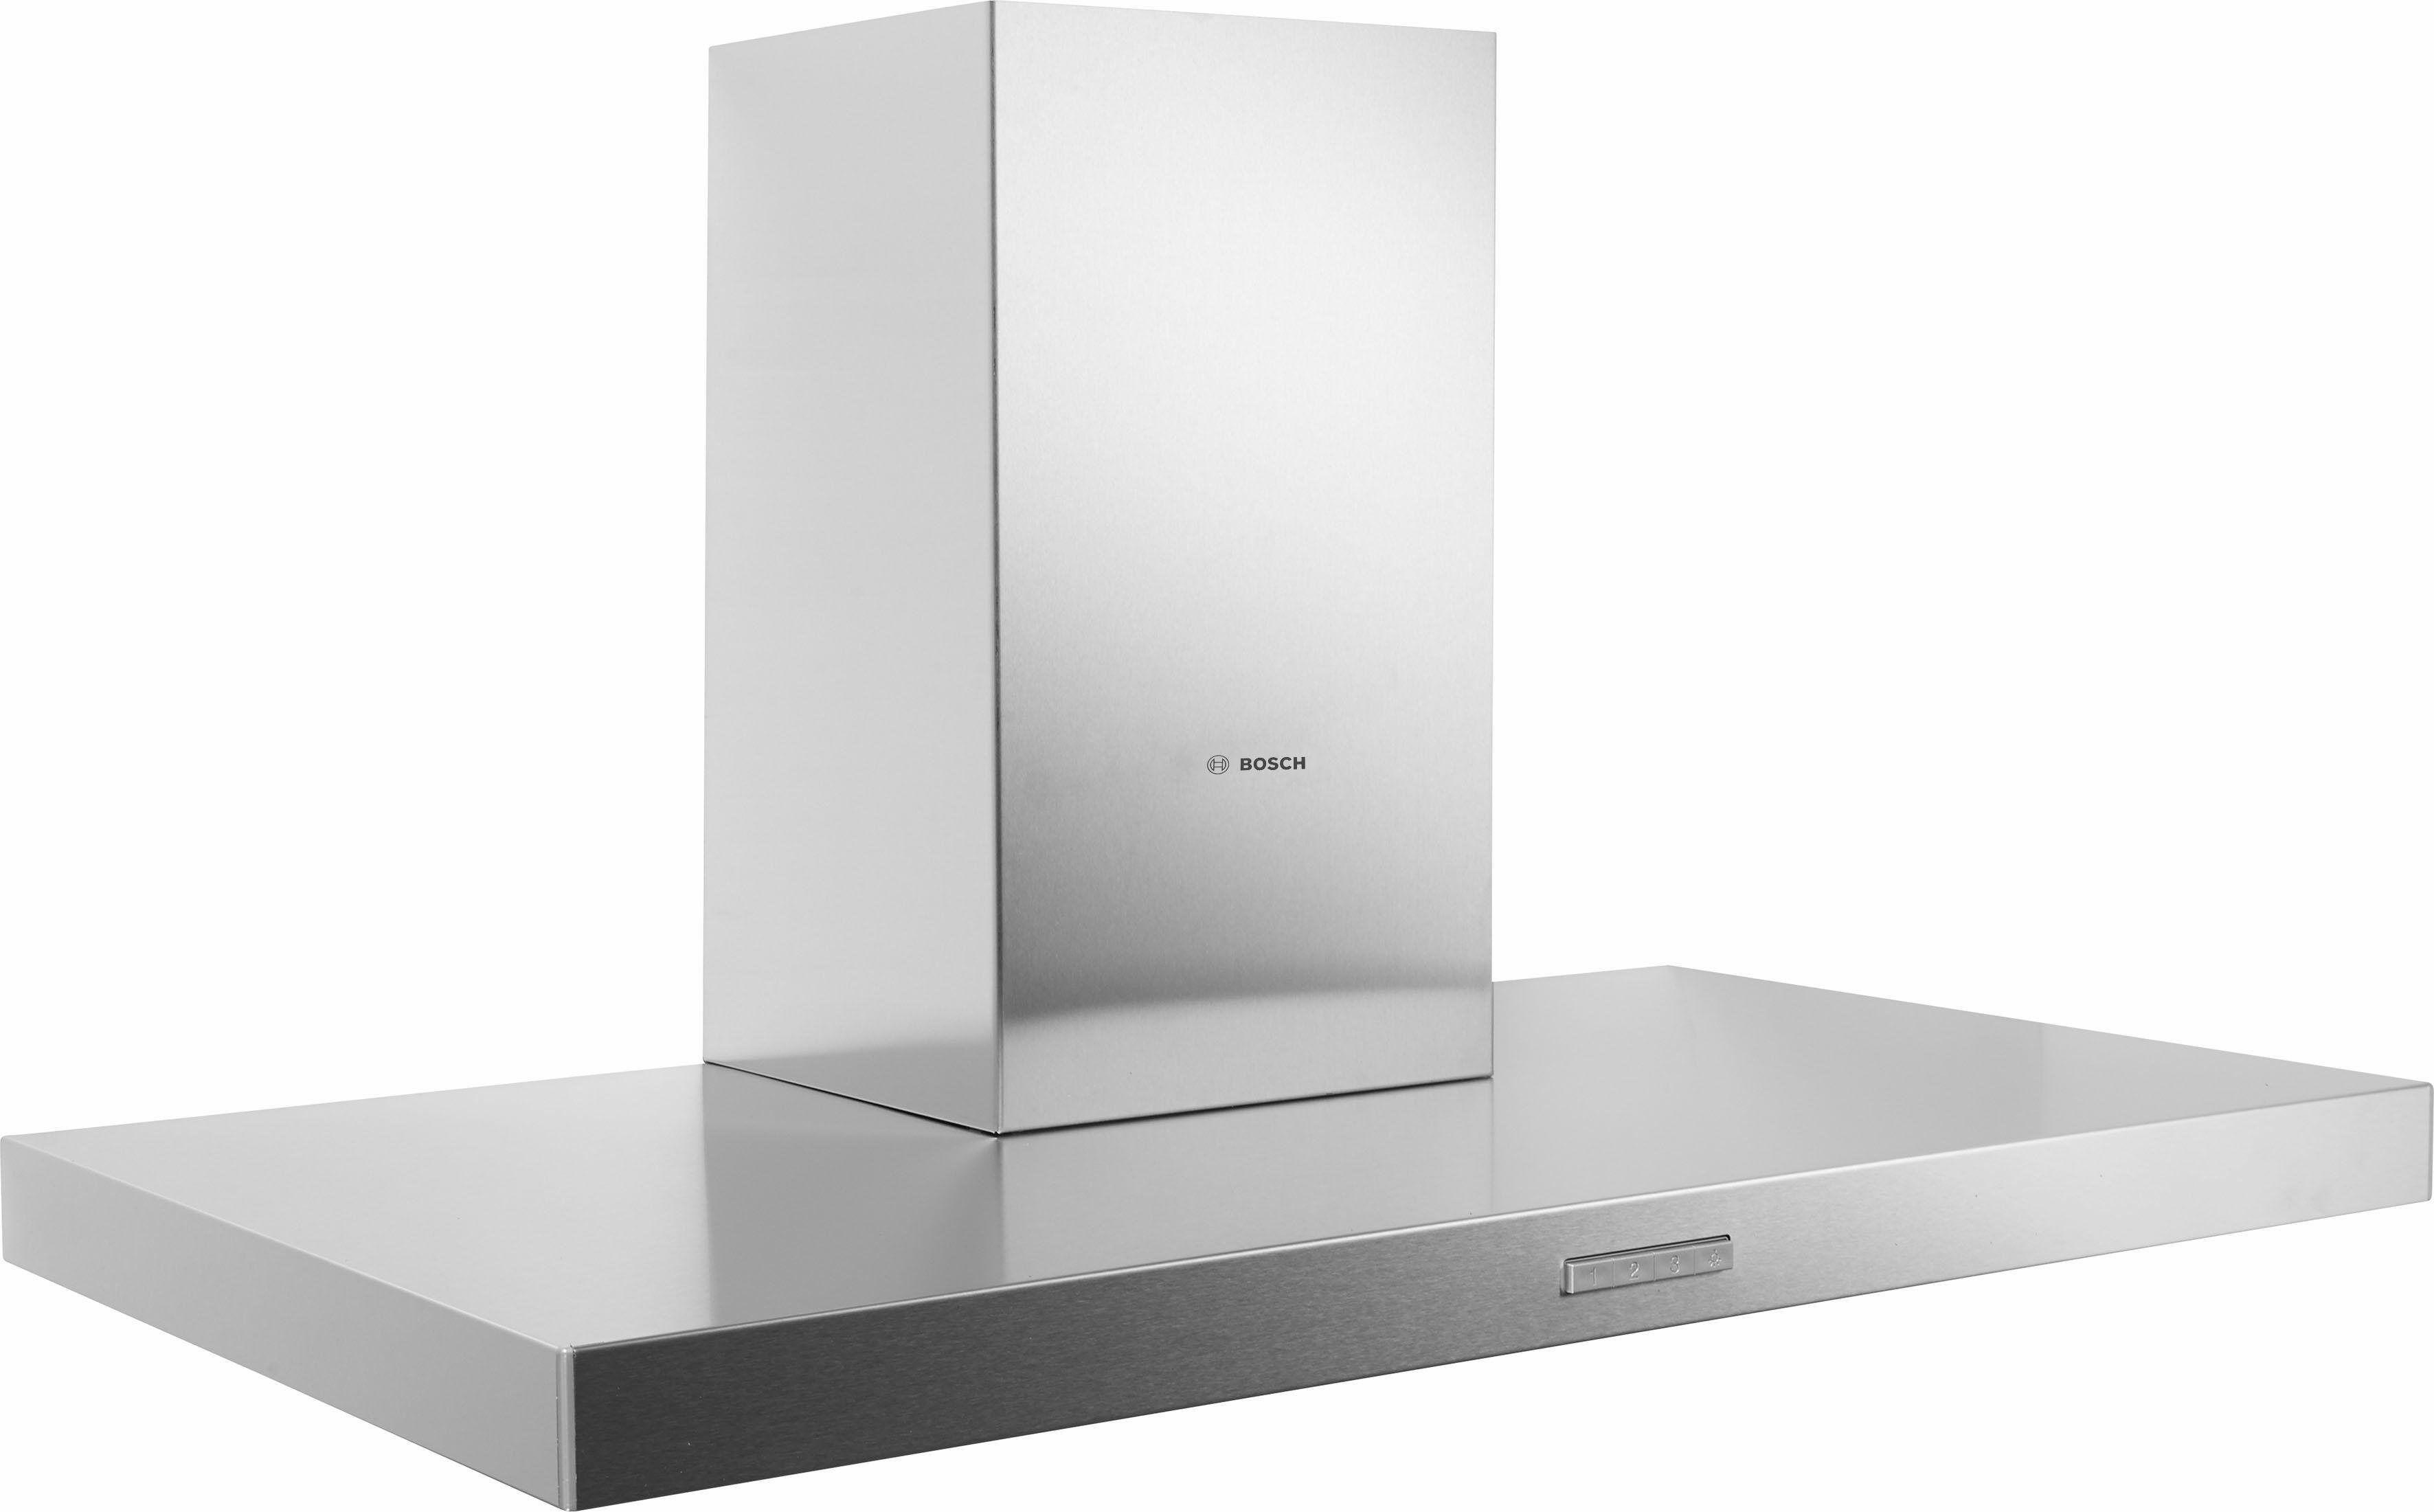 Bosch Wandhaube DWB96BC50, Energieeffizienzklasse A